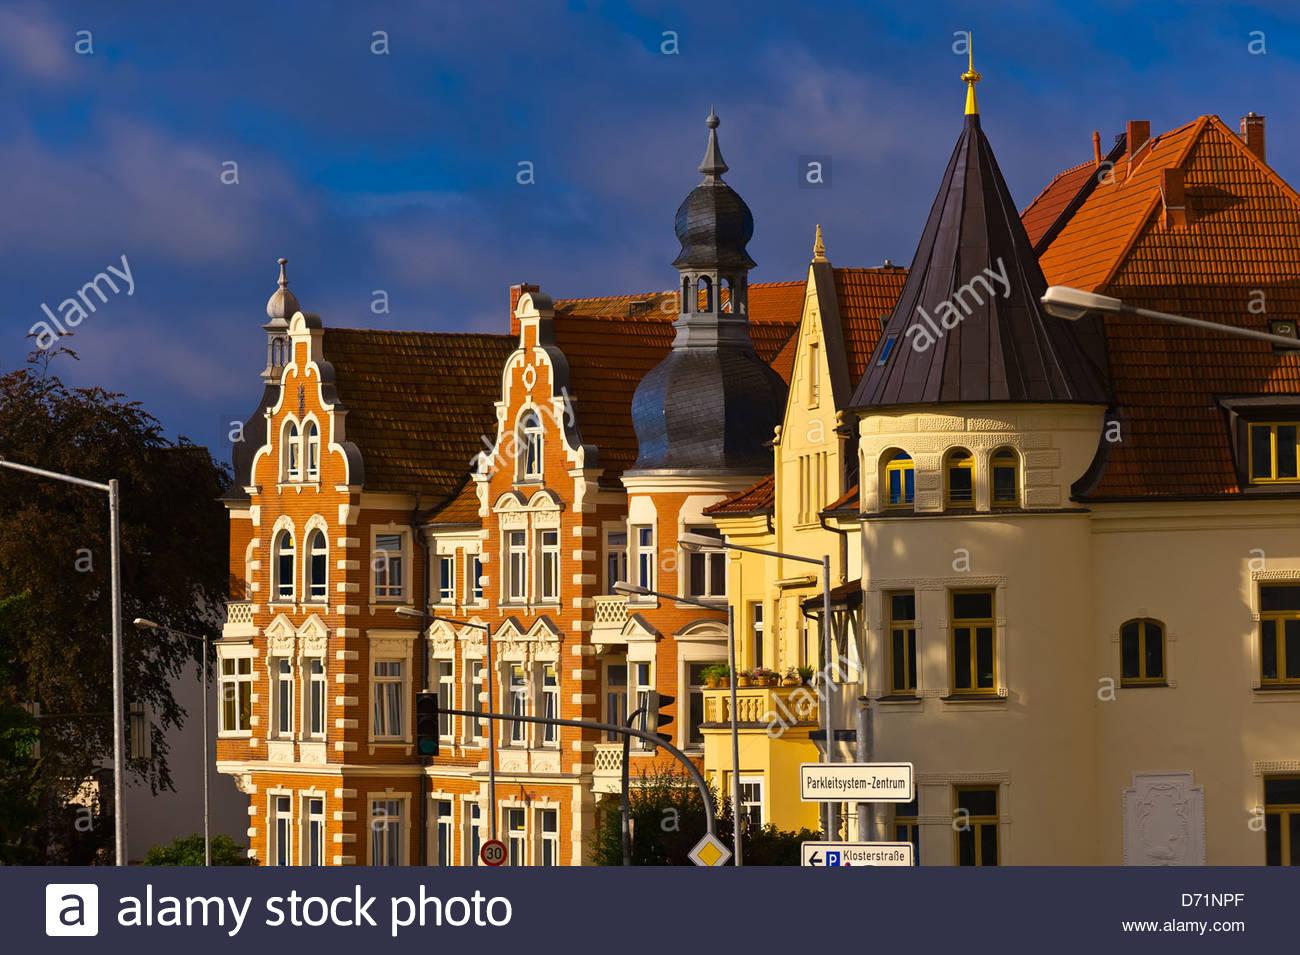 Ornate buildings, Schwerin, Mecklenburg-West Pomerania, Germany - Stock Image